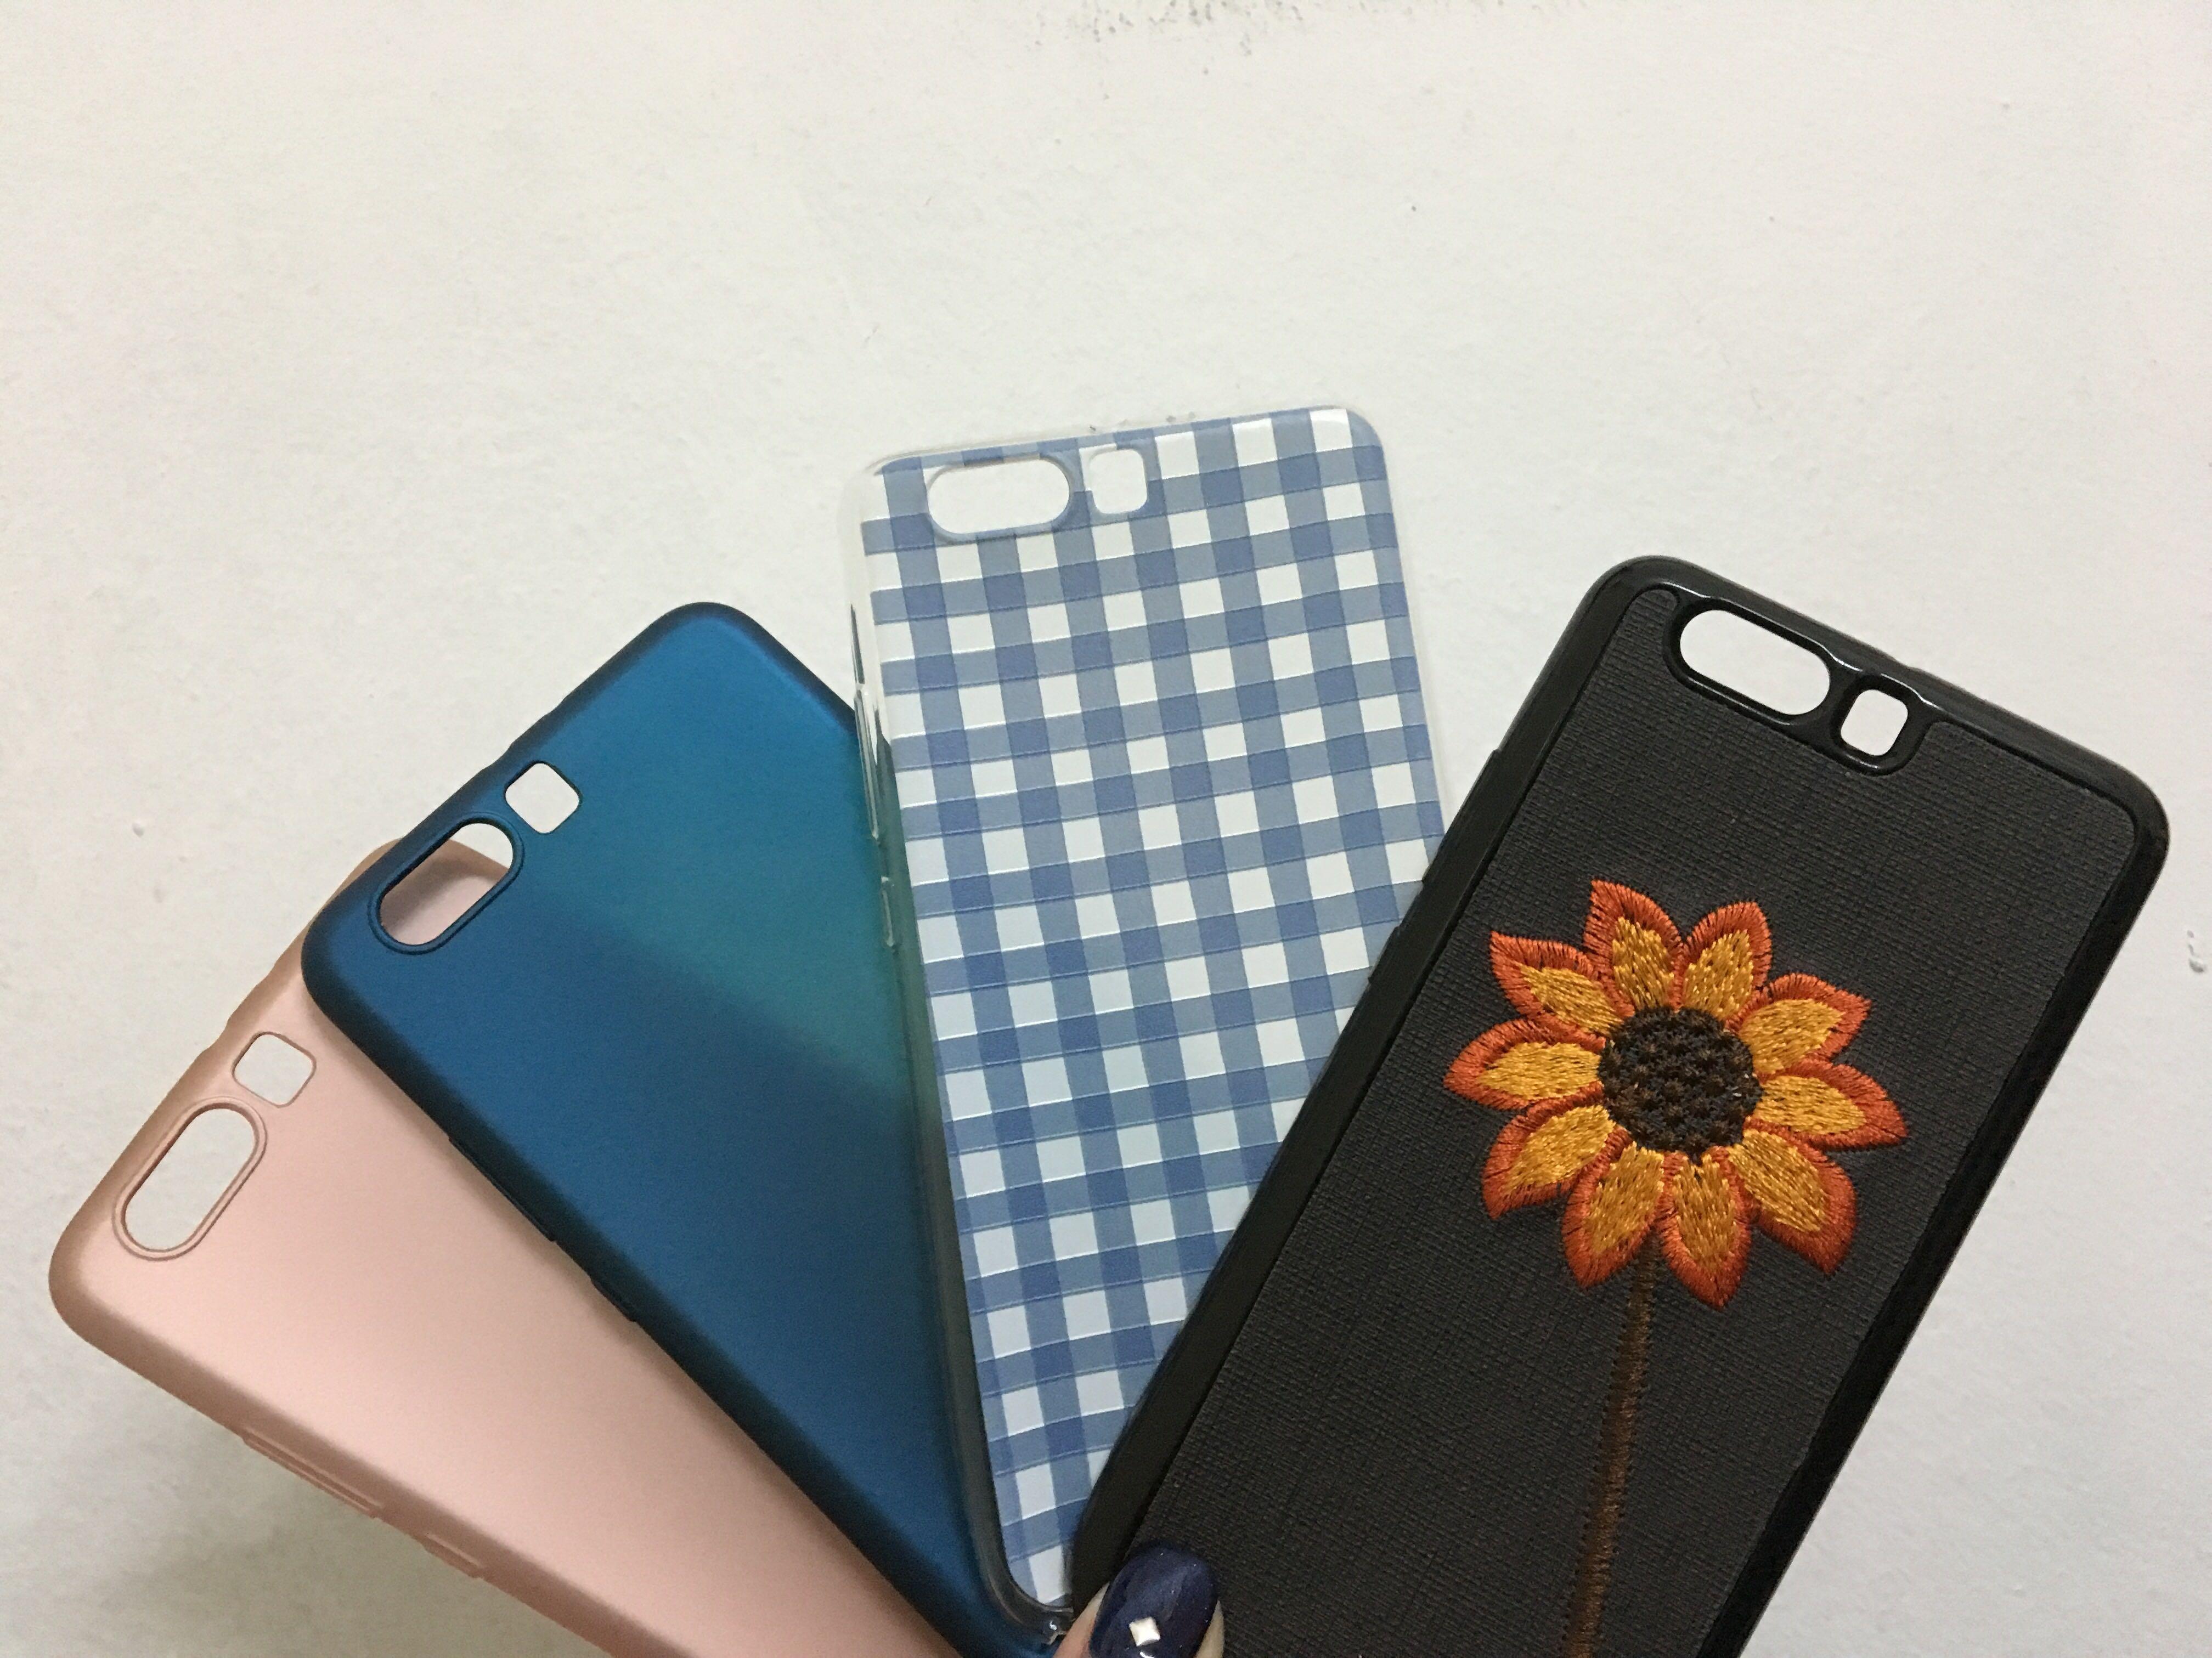 Huawei P10 Plus Phone Case Mobiles Tablets Mobile Tablet Doraemon Polkadot Redmi 5a 5x 5plus Photo